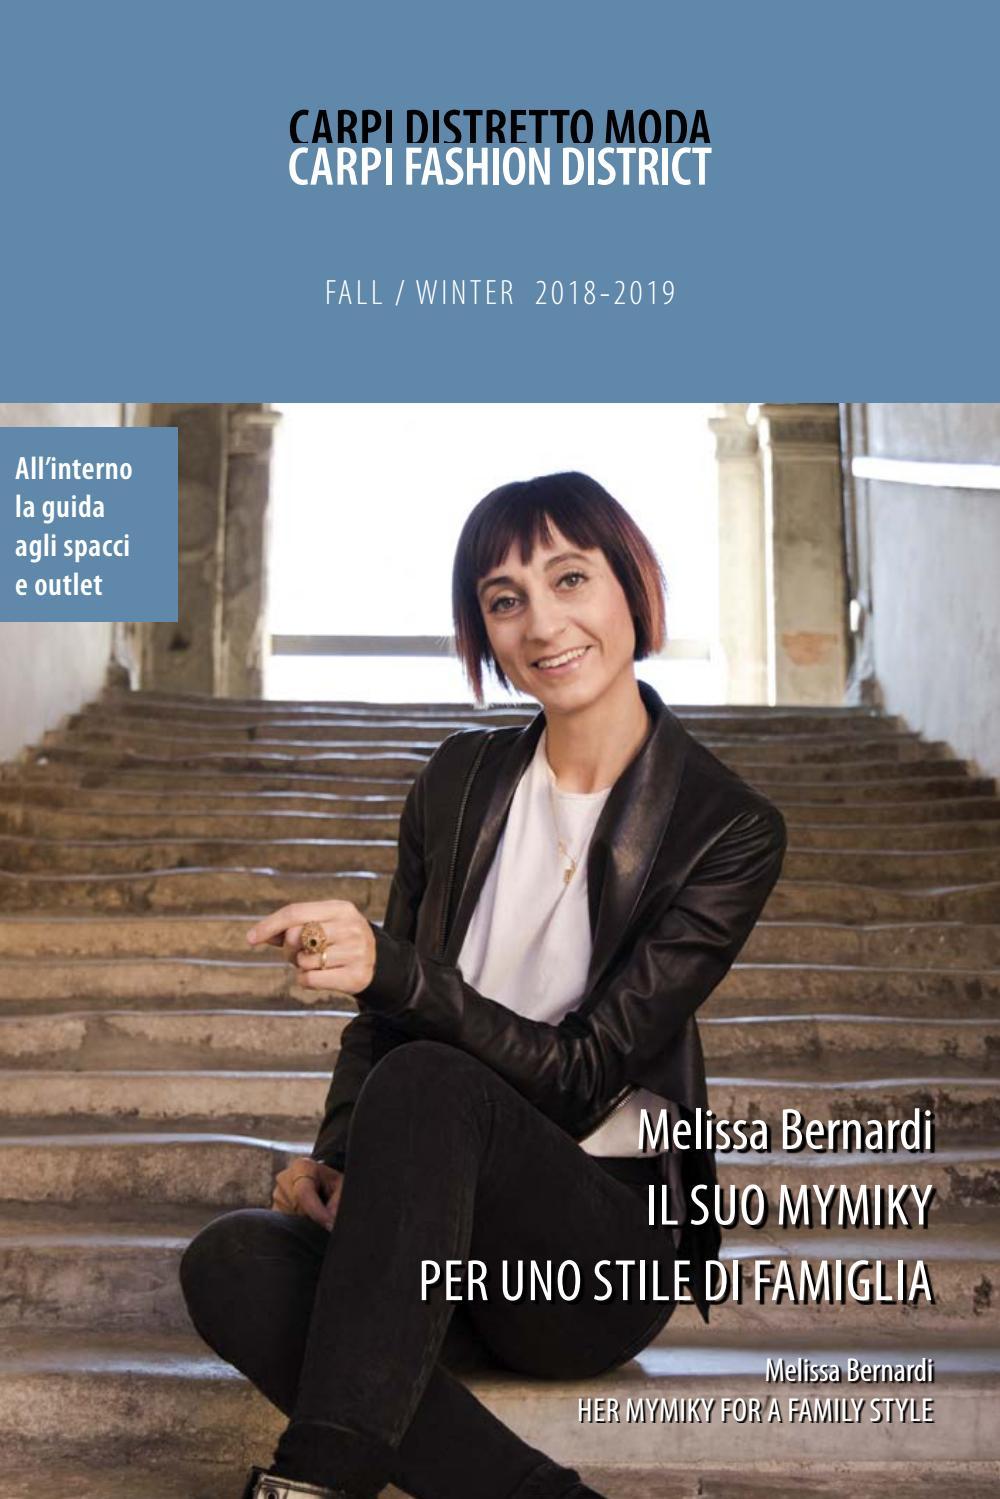 Carpi Distretto Moda FallWinter 2018 2019 by Voce di Carpi